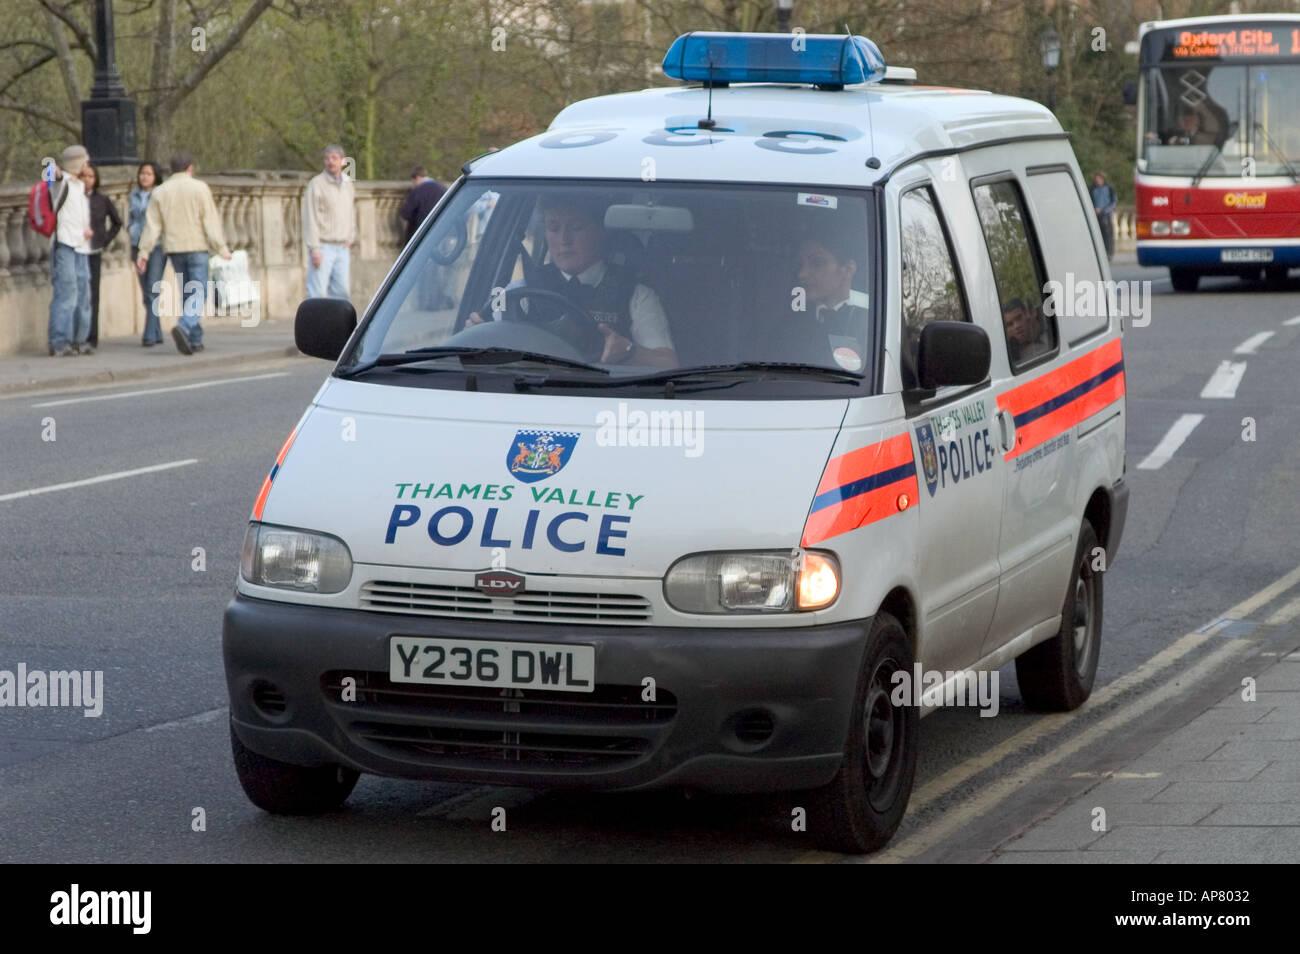 Thames valley police van on Magdalen bridge Oxford - Stock Image